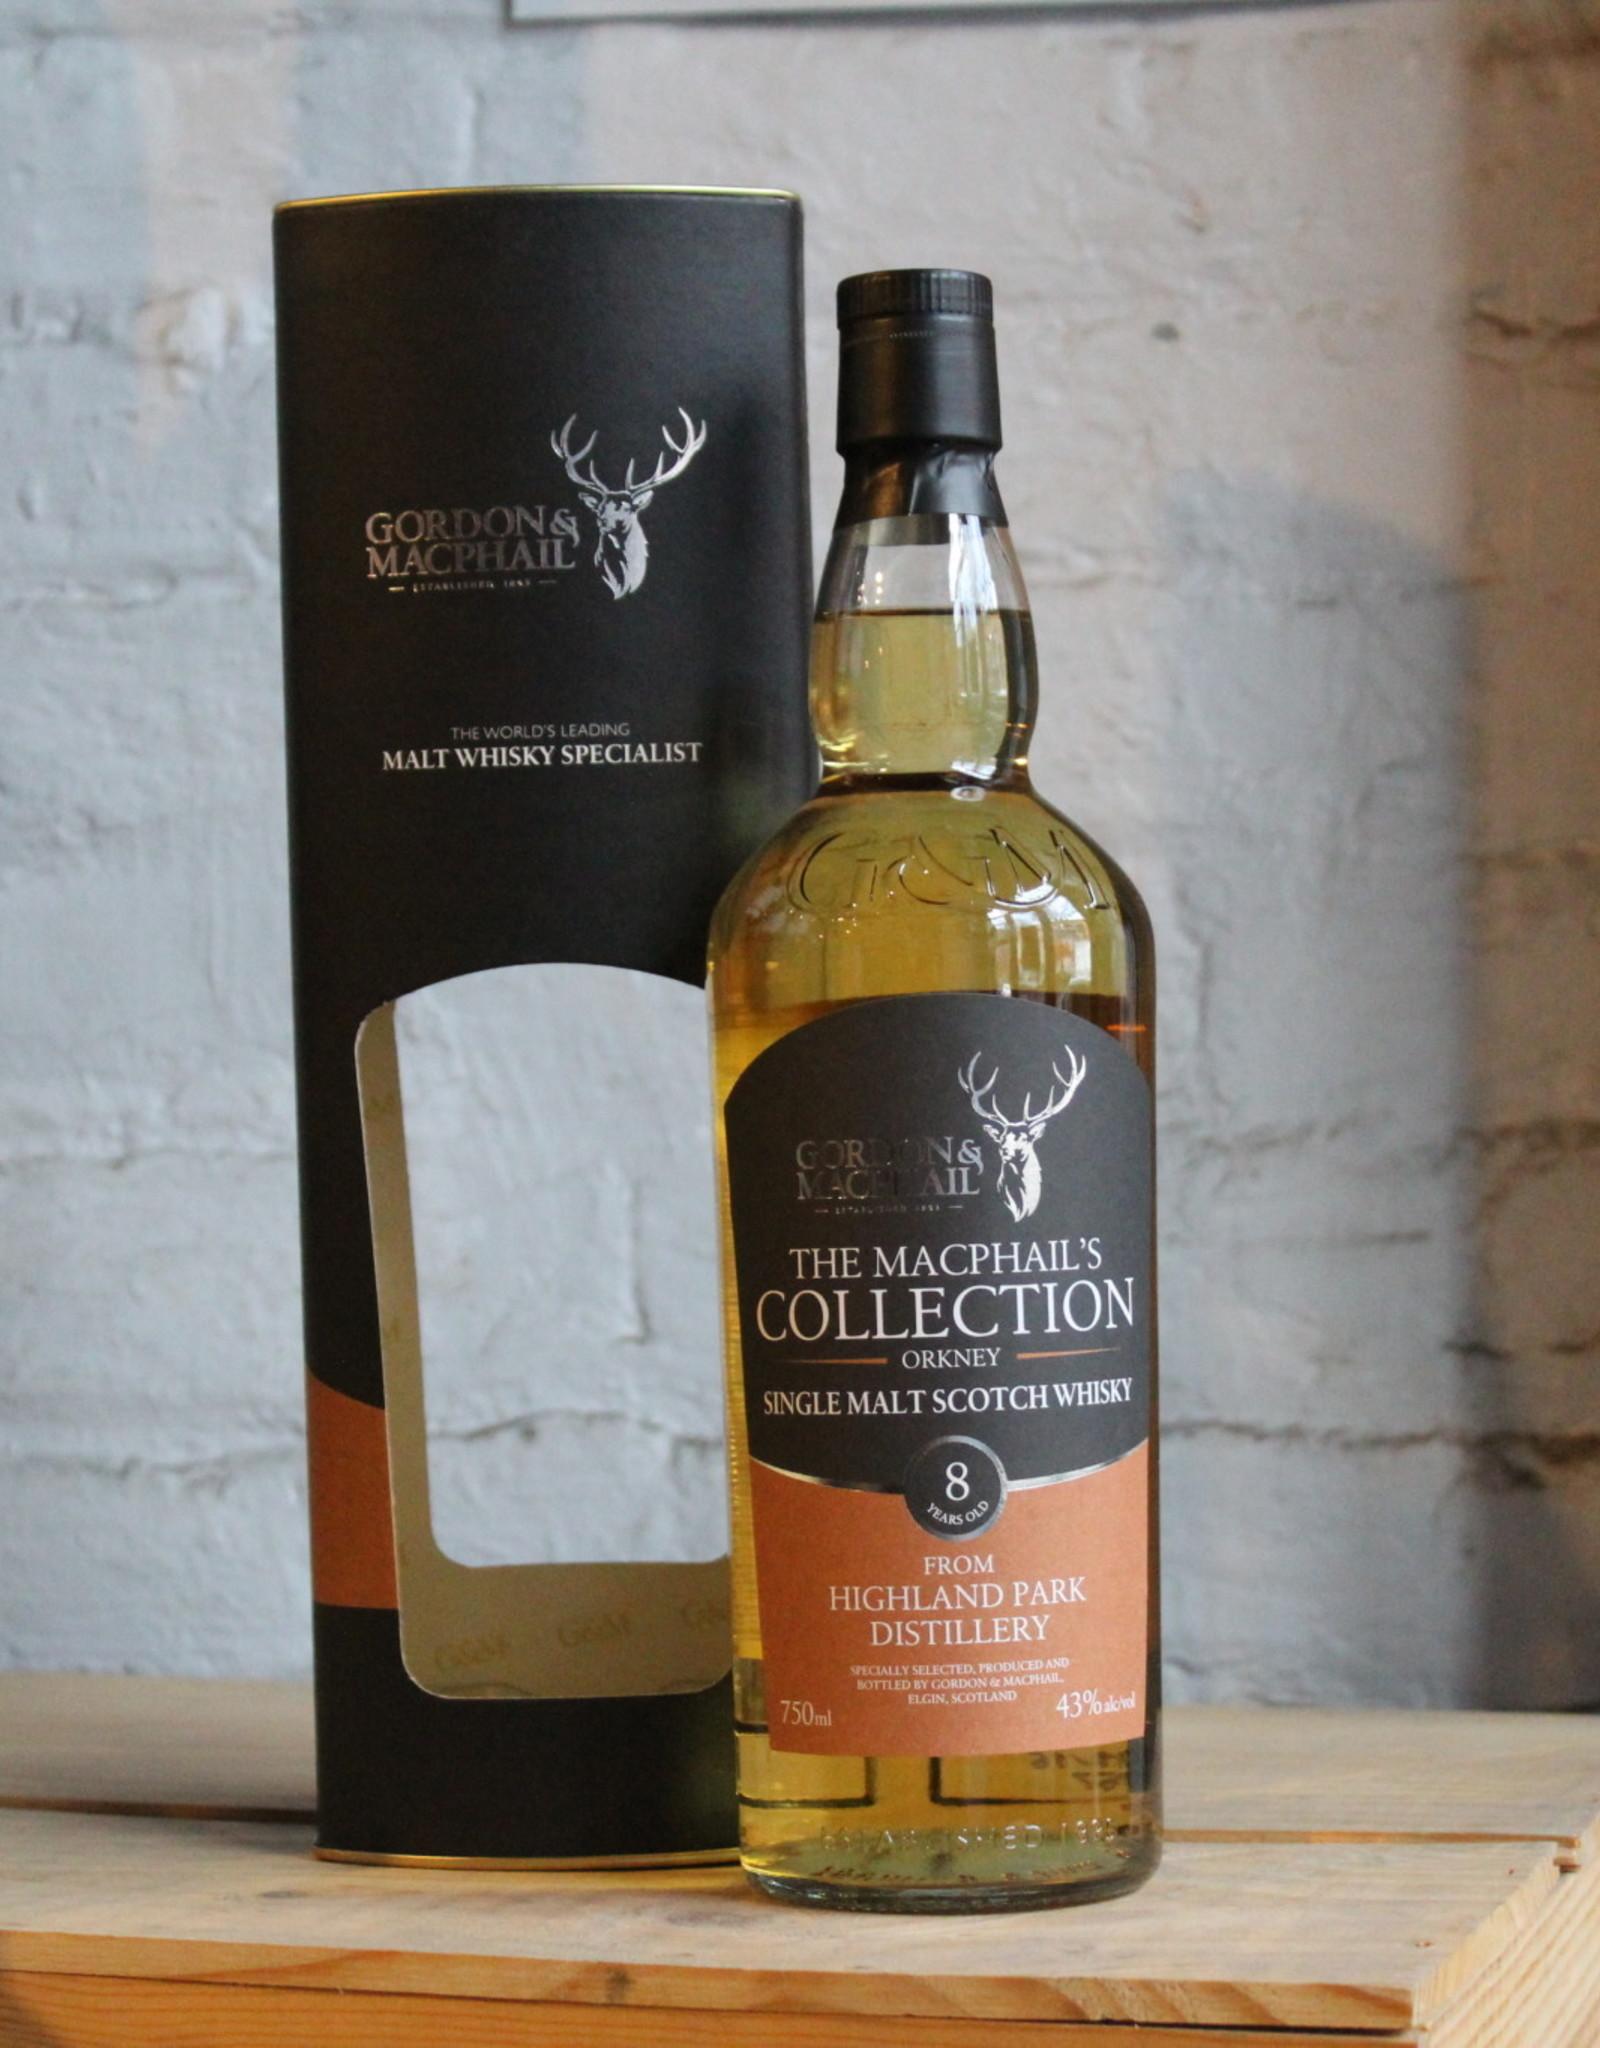 Gordon & Macphail Highland Park 8yr Single Malt Scotch Whisky - Orkney Islands, Scotland (750ml)